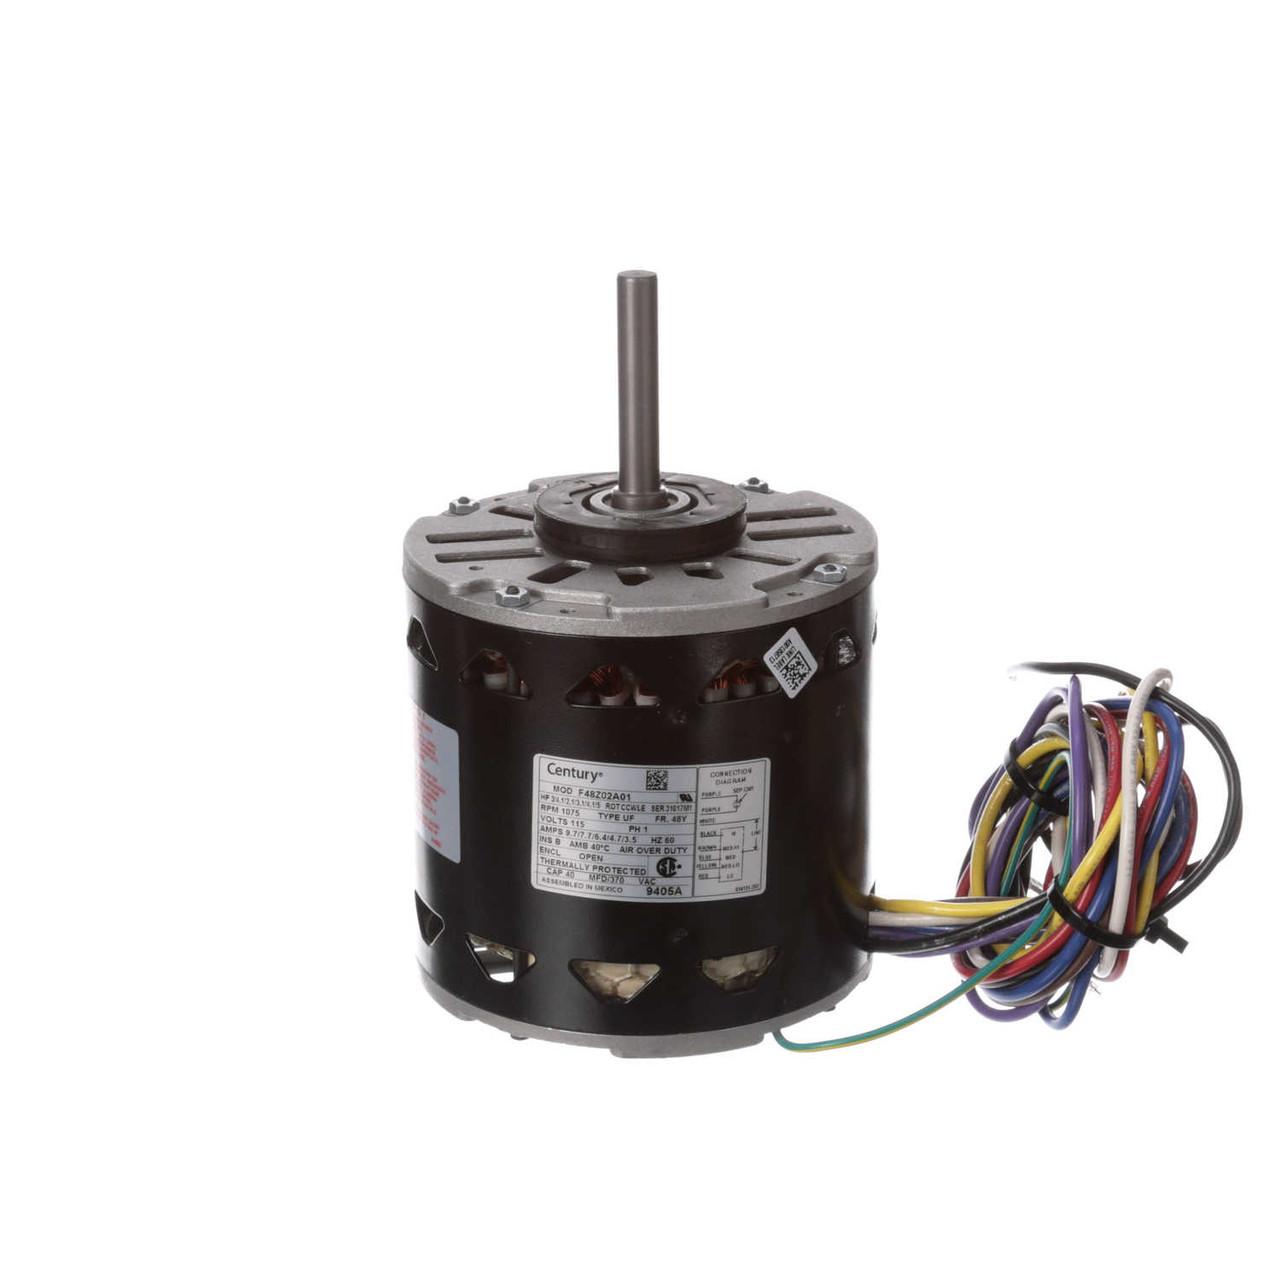 medium resolution of lennox k55hxnnz 7057 furnace motor 3 4 hp 1075 rpm 115v century 9405a